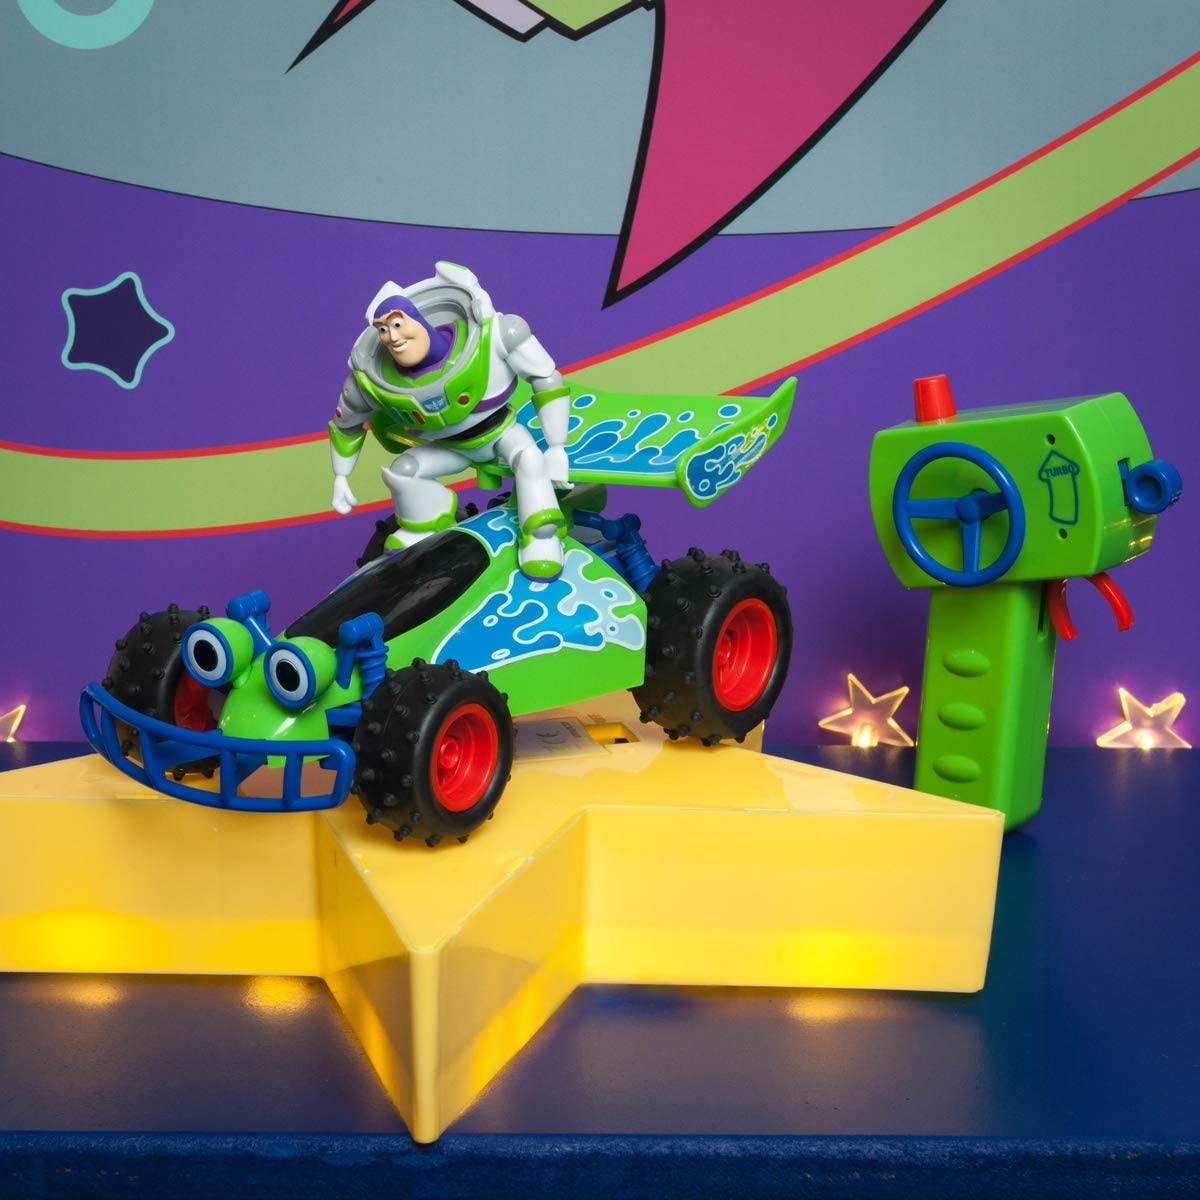 Dickie-RC Toys 201134004 Toy Story Buggy-Coche teledirigido (Escala 1:24, 20 cm), Color Verde/Blanco/Azul